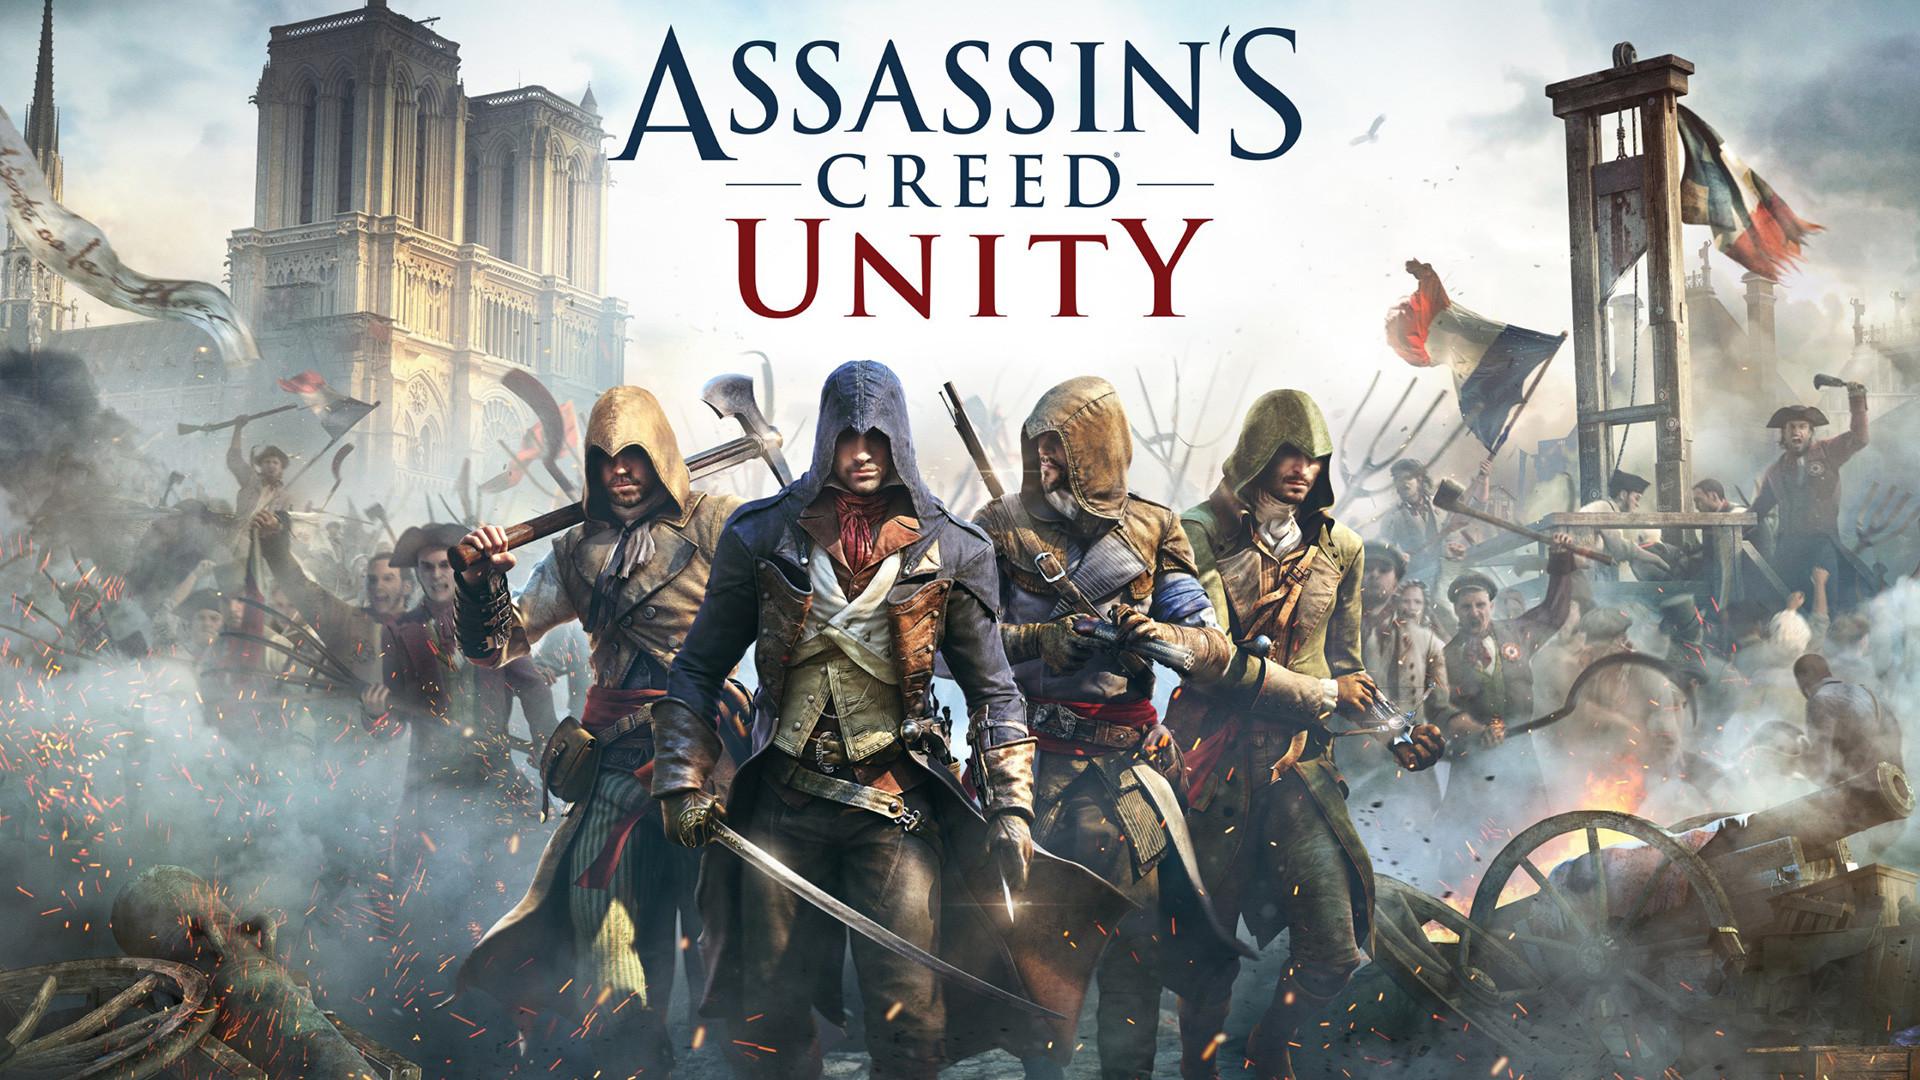 Assassin's Creed Unity Wallpaper 1080p   Assassins creed wallpaper   Assassins  creed Story   #11